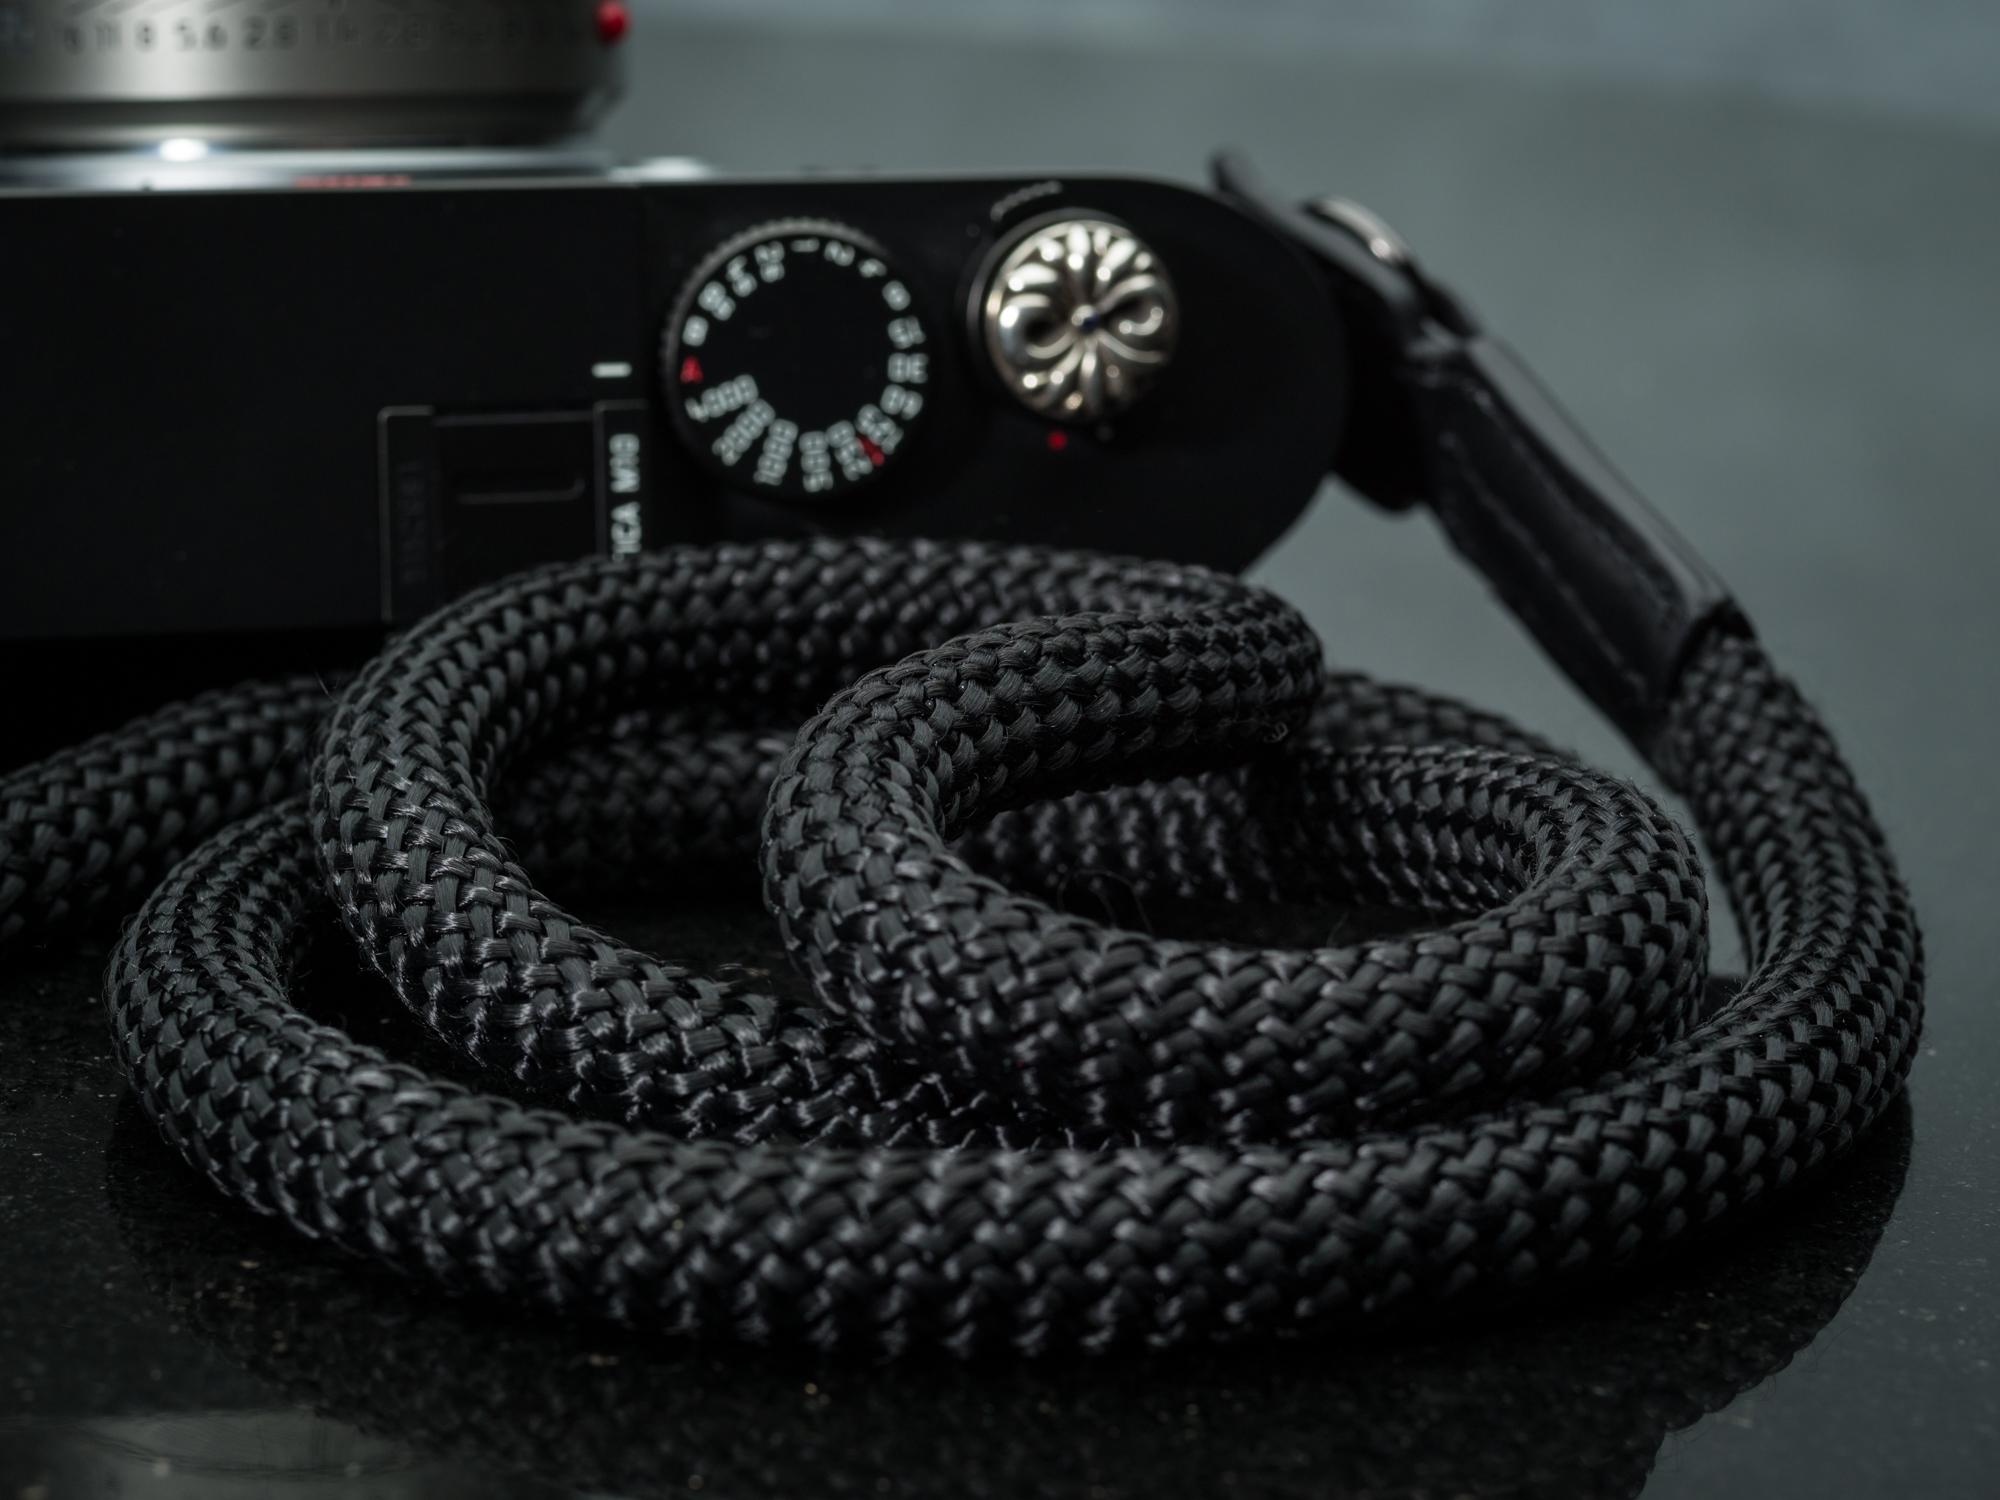 vi vante sheetline best rope strap